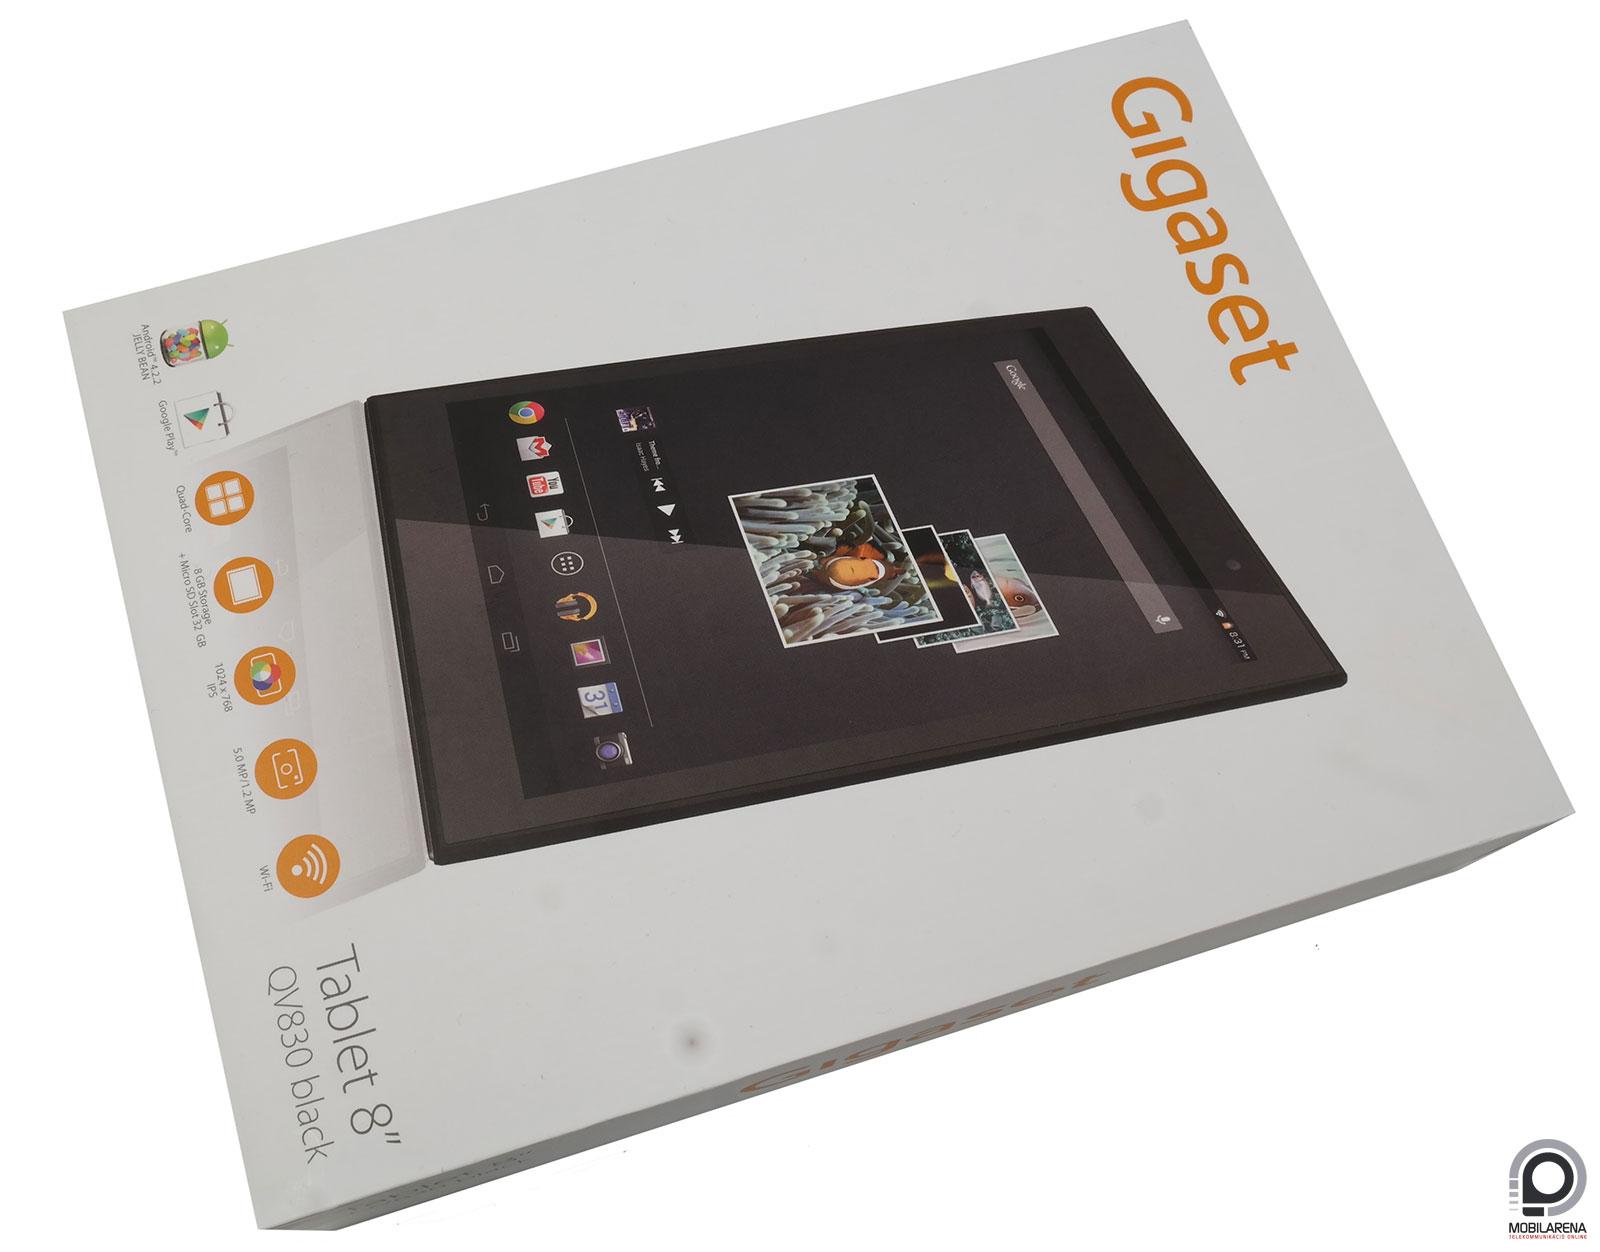 gigaset qv830 b rhov mehetsz vihetsz mobilarena tablet teszt. Black Bedroom Furniture Sets. Home Design Ideas